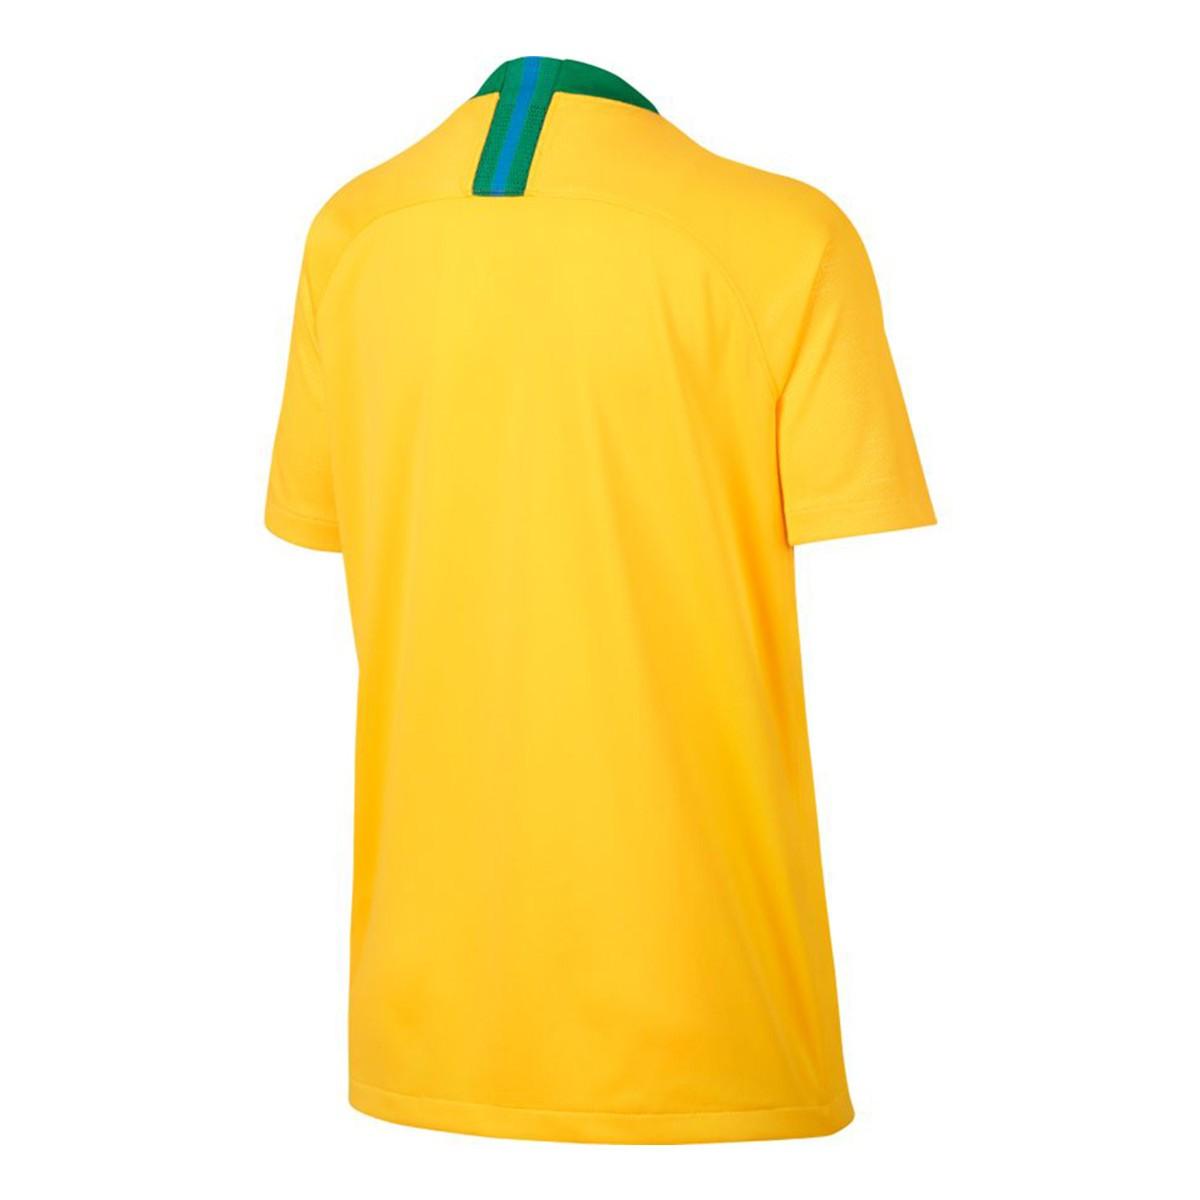 9acfcf3212bec Camiseta Nike Brasil Breathe Stadium Primera Equipación 2018-2019 Niño  Midwest gold-Lucky green - Tienda de fútbol Fútbol Emotion